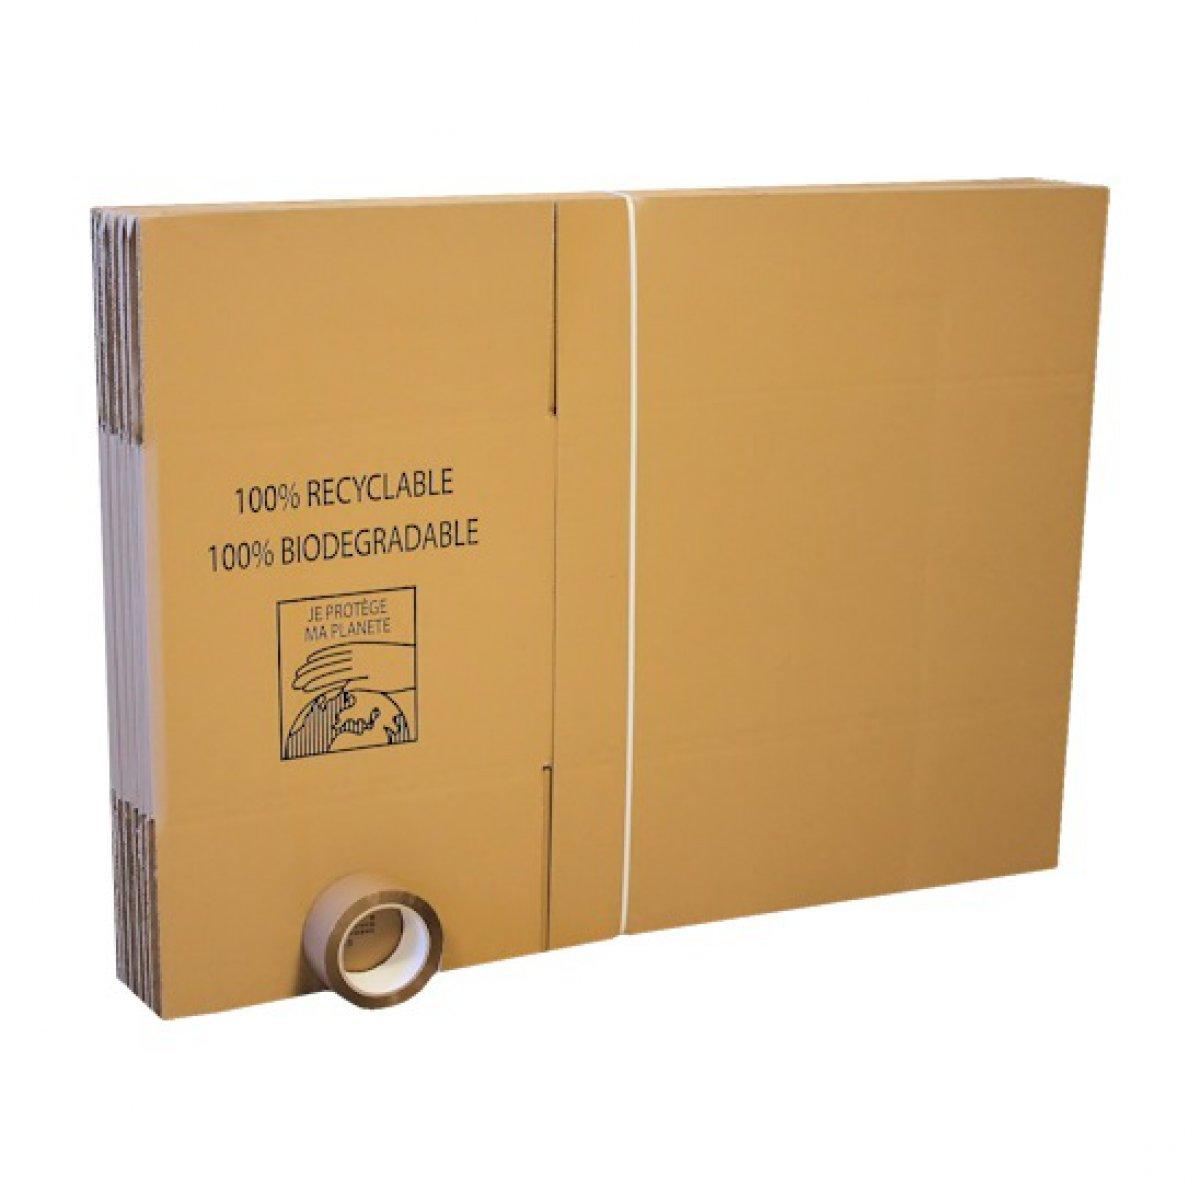 Pack 10 Cartons Standard Adhesif 66m 55x35x30cm